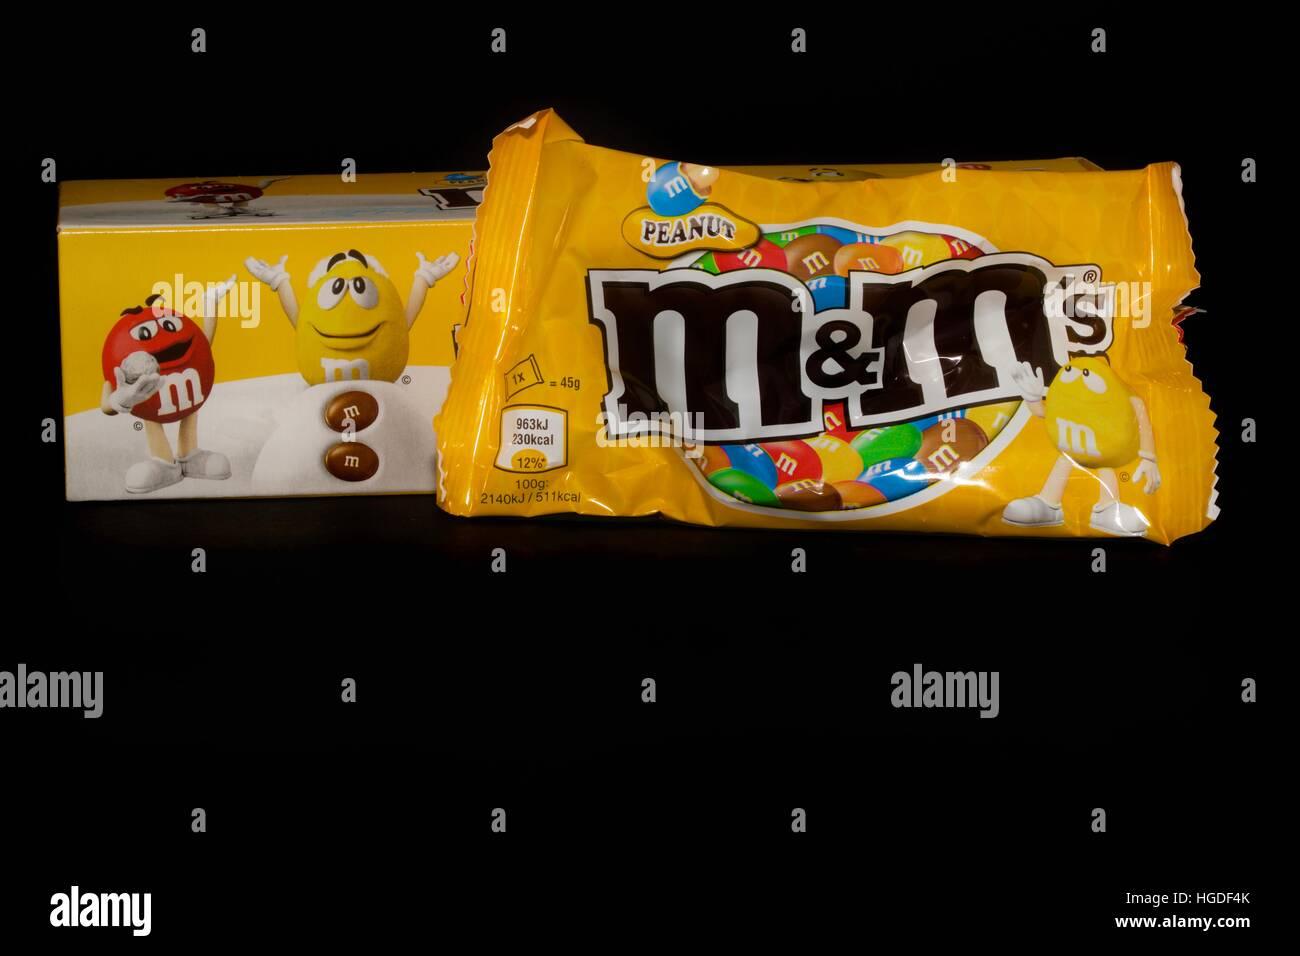 Box of Merry Christmas peanut M&M\'s Stock Photo: 130604339 - Alamy